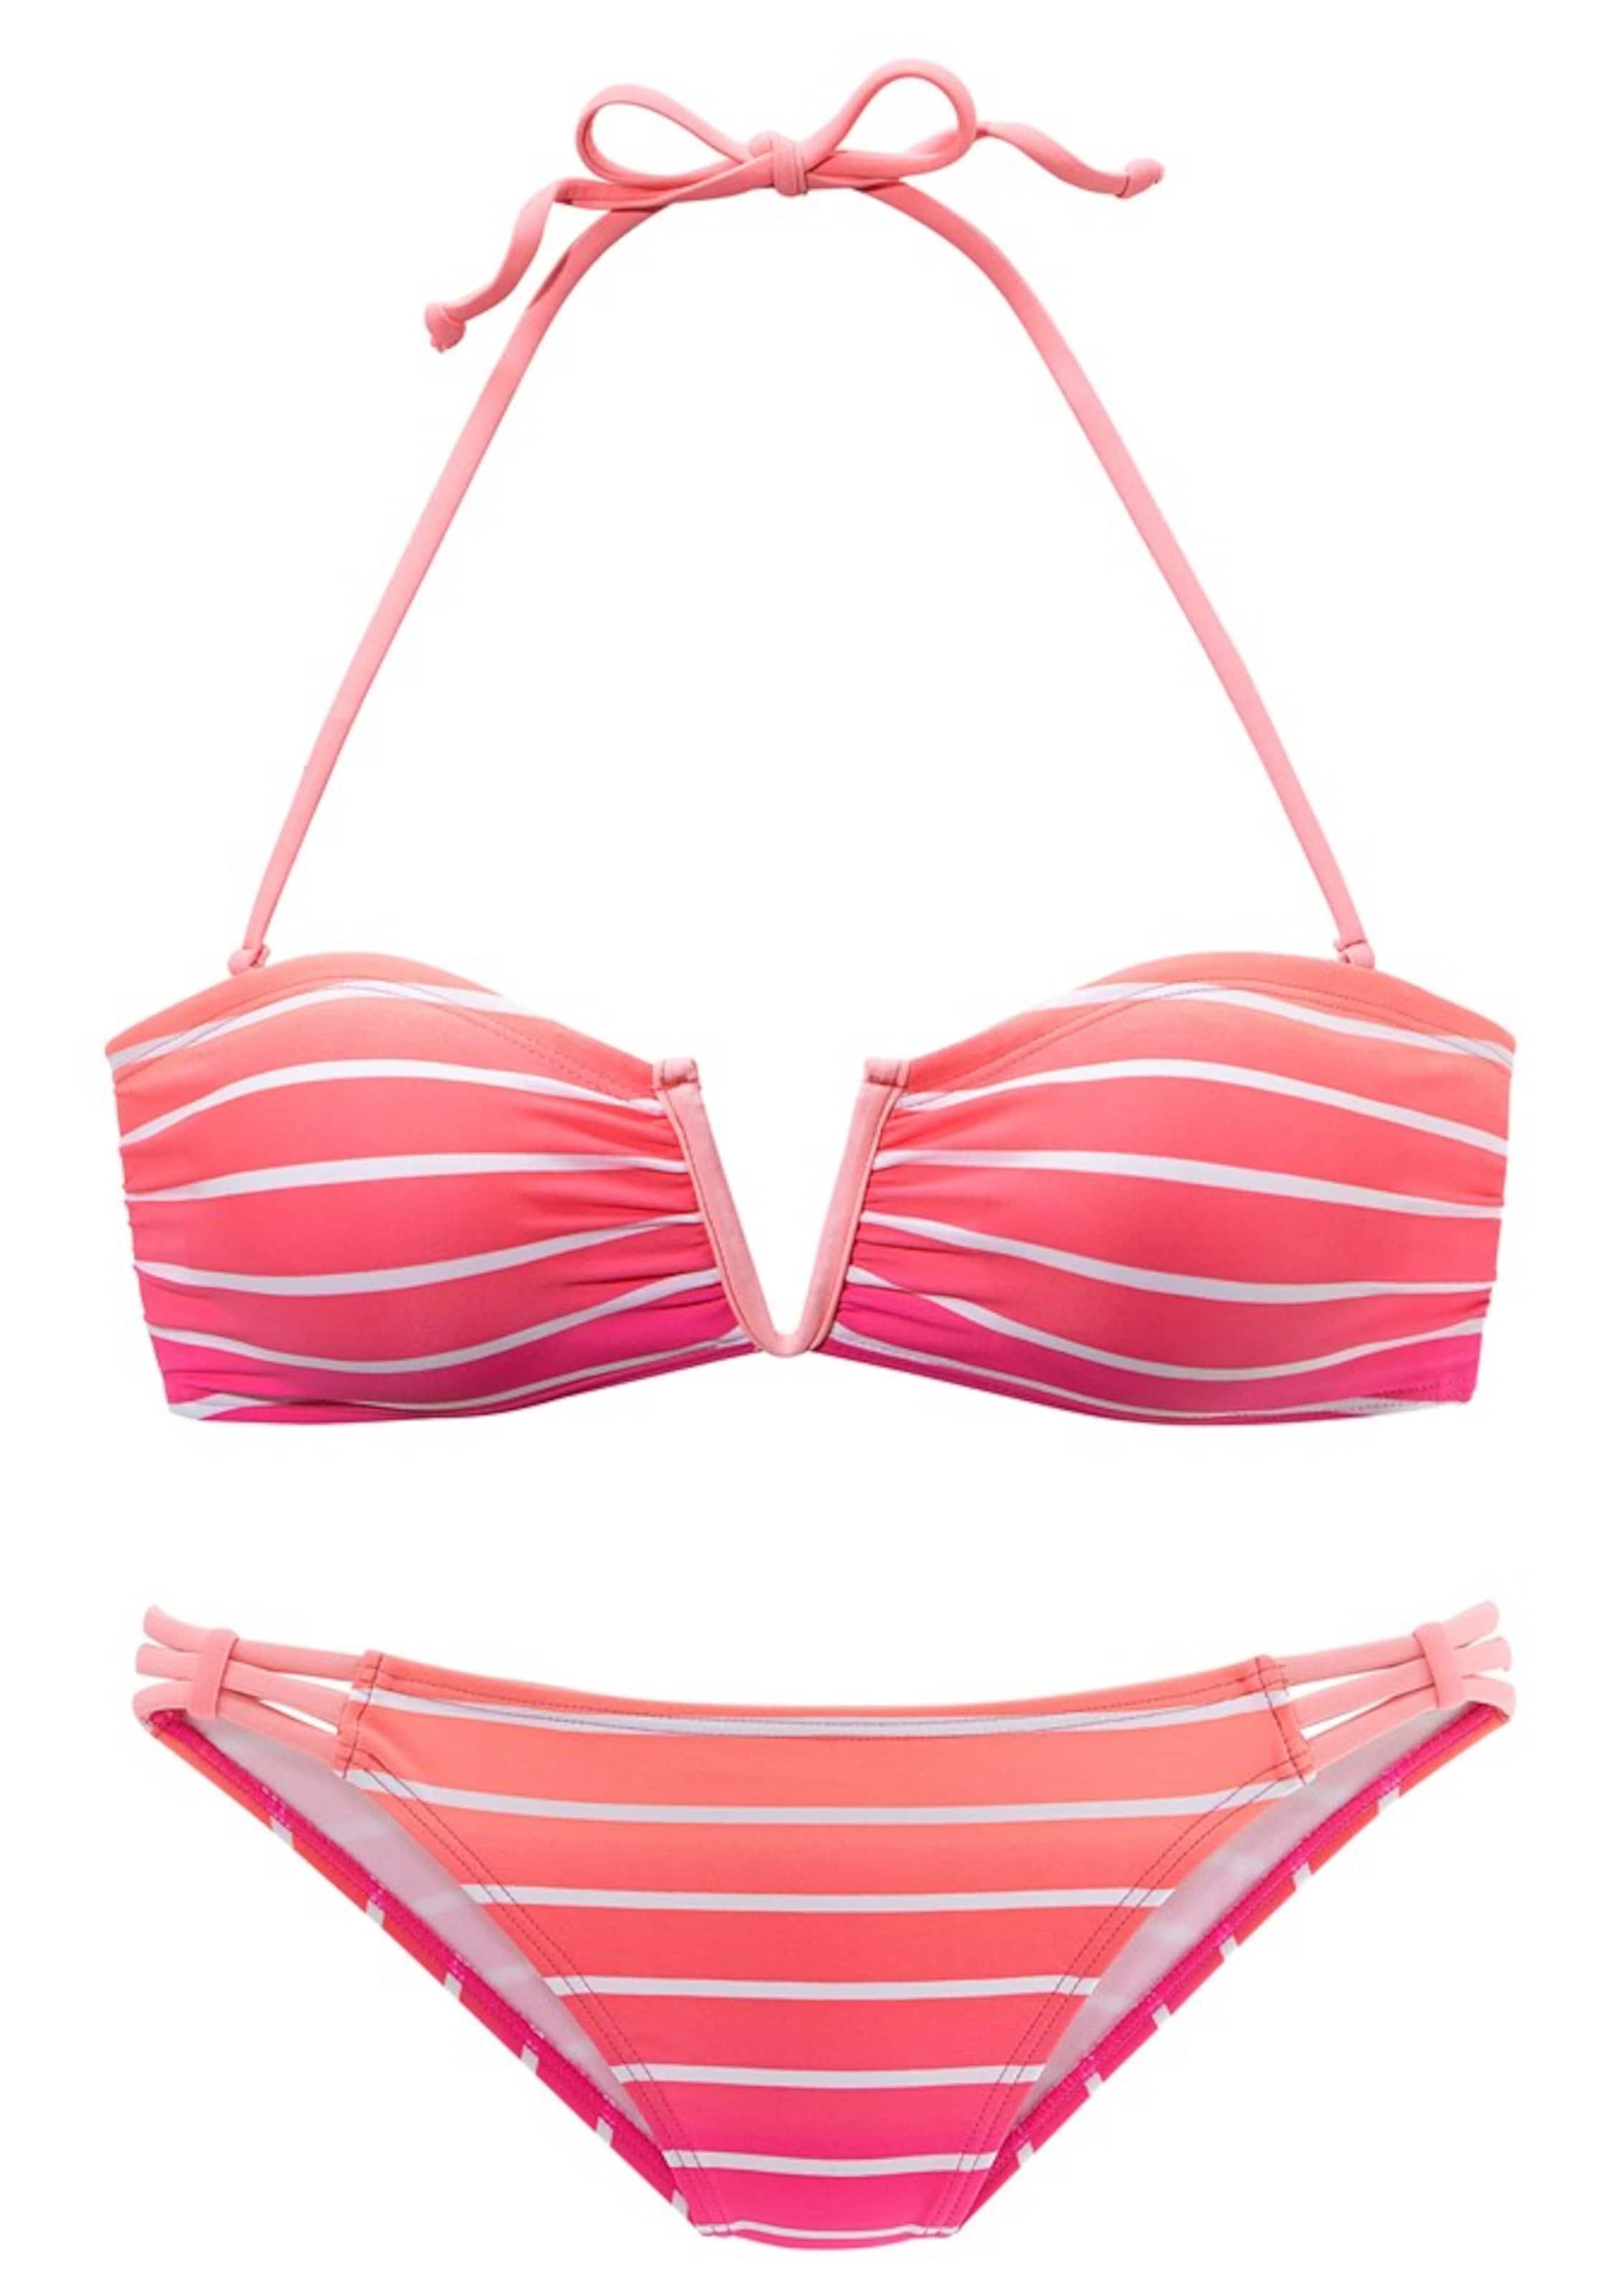 Rabatt Bilder Billig Verkauf Großer Verkauf VENICE BEACH Bandeau-Bikini AKfU4